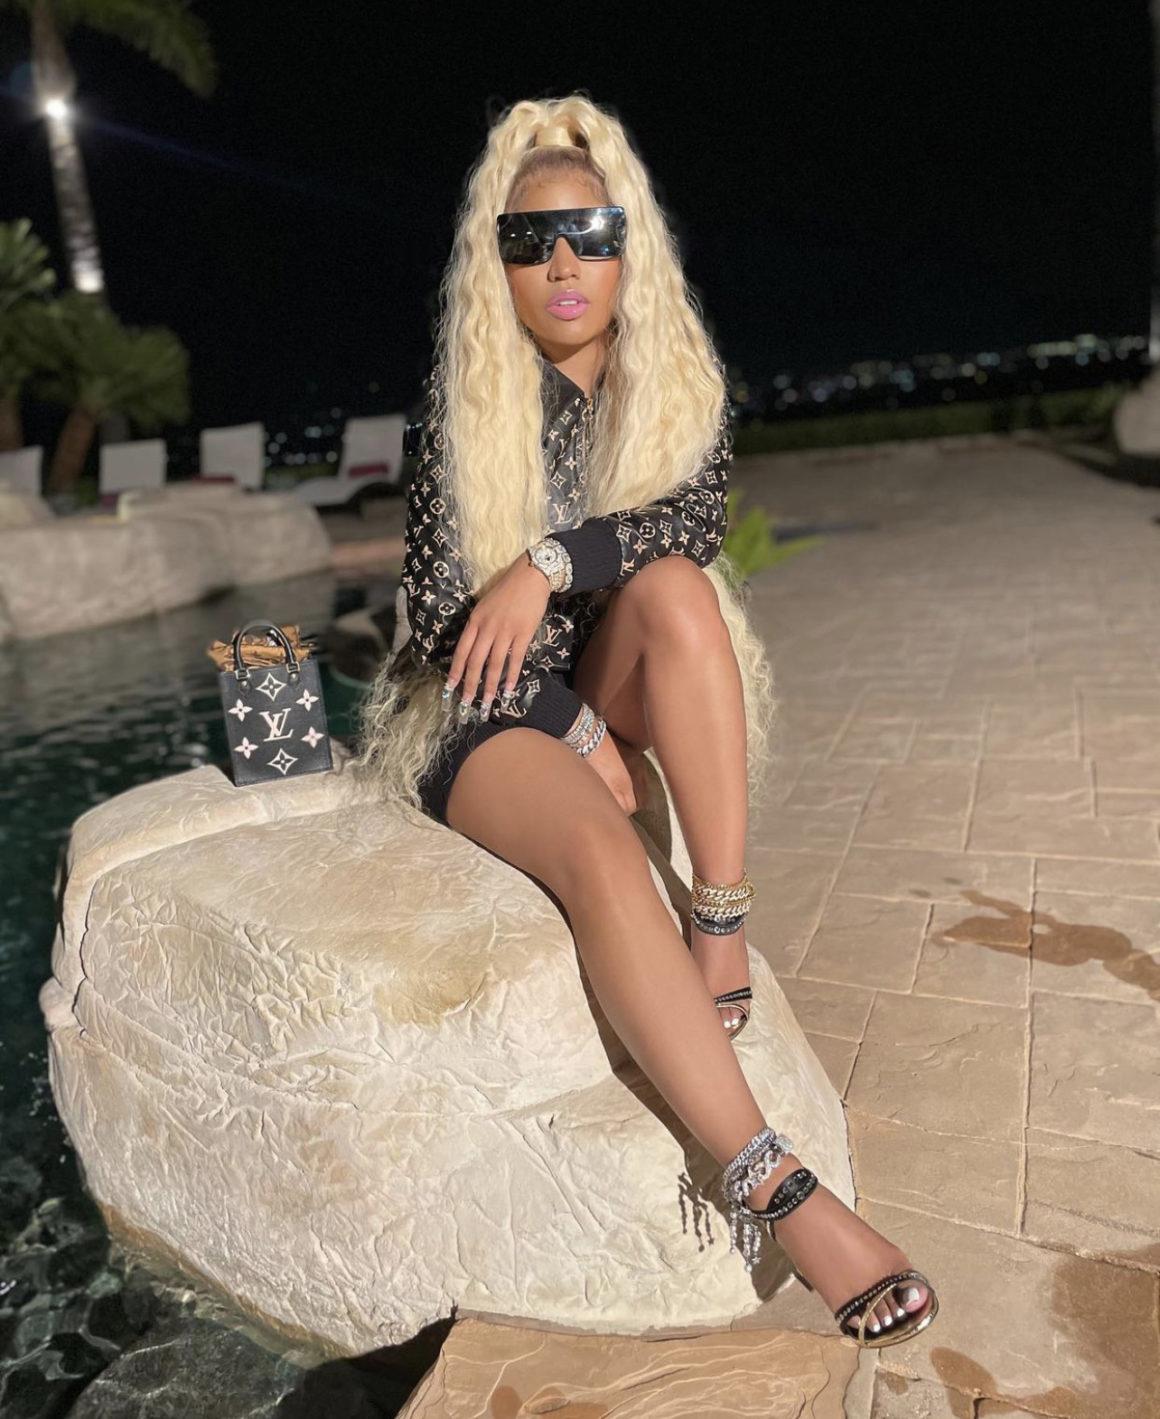 Nicki Minaj Promotes 'Whole Lotta Money' Remix Wearing Louis Vuitton Look Including Monogram Leather Bomber Jacket and Mini Monogram Handbag